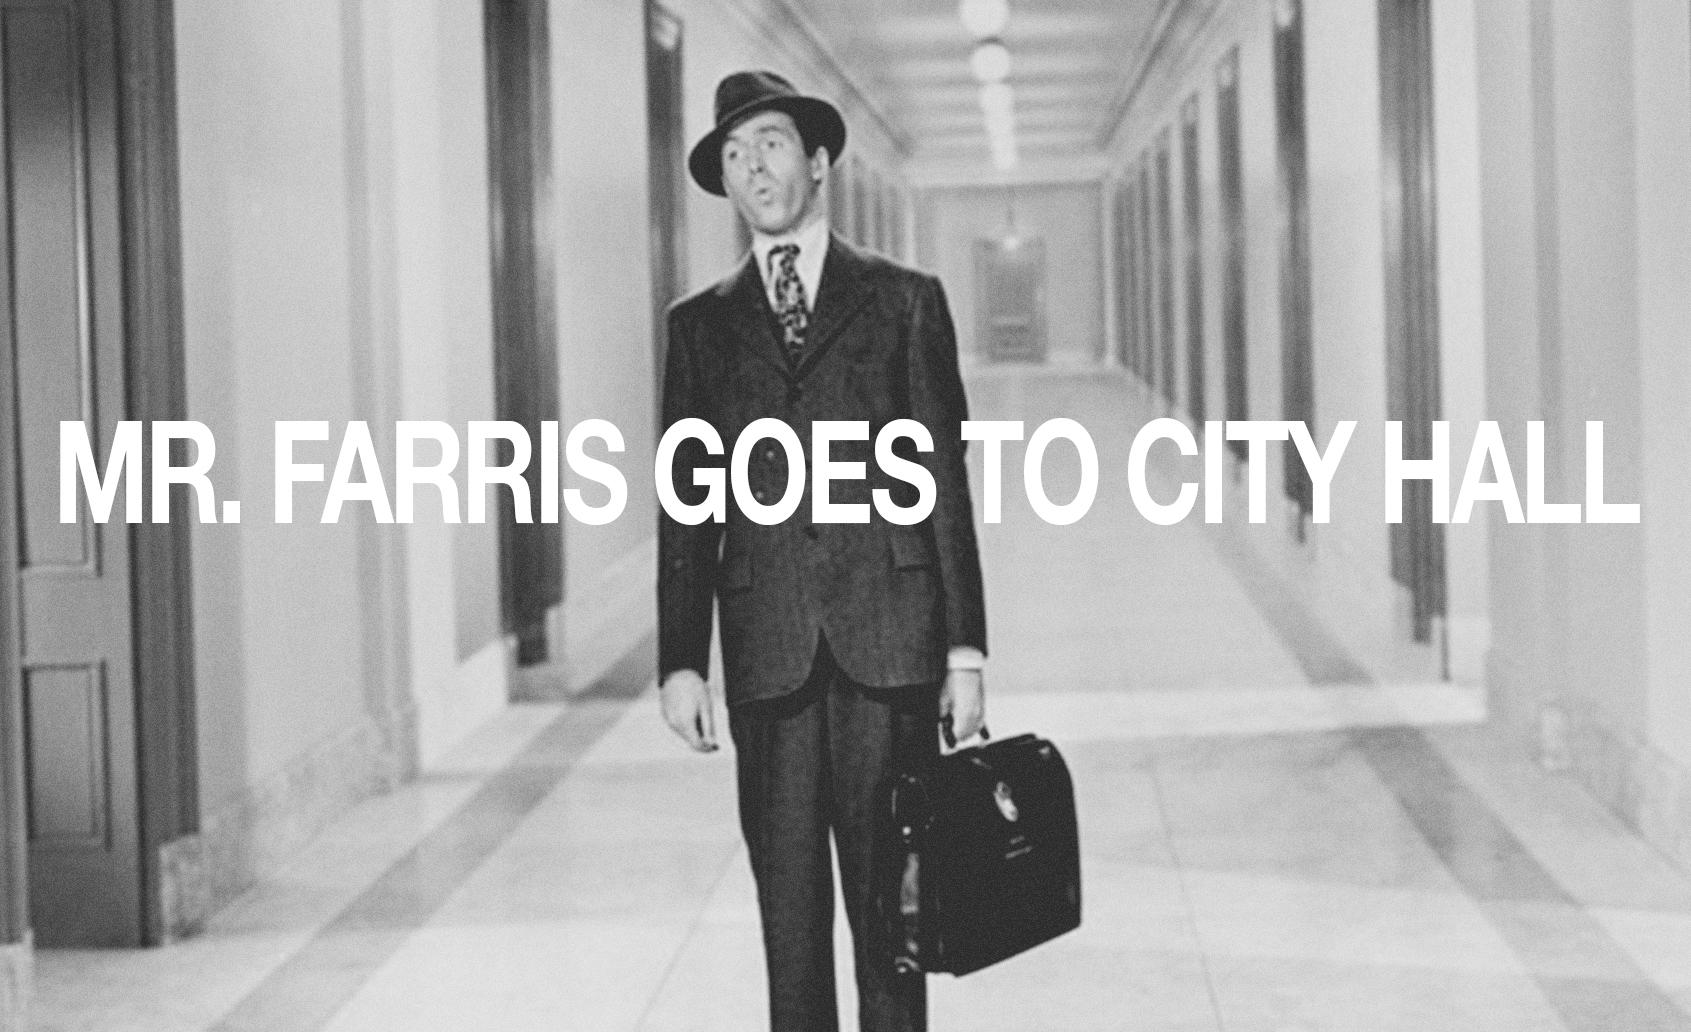 glen goes to city hall.jpg